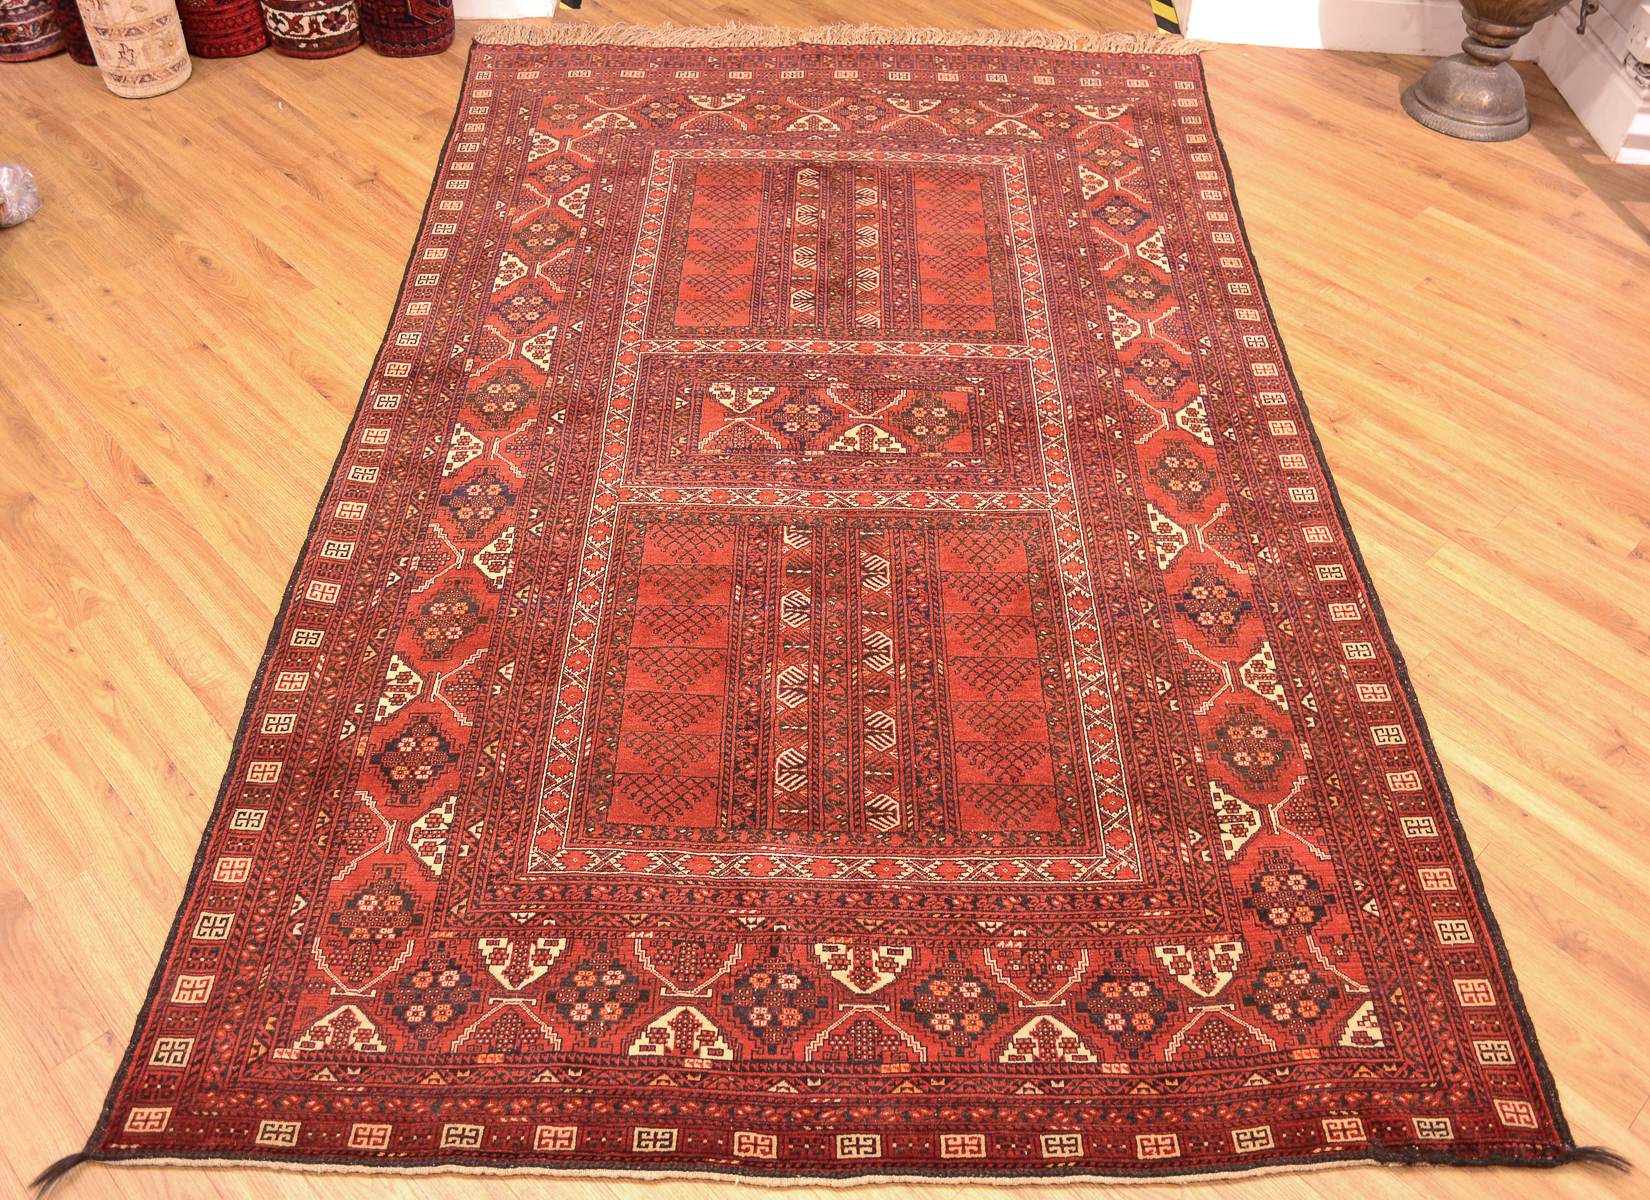 Fine Old Afghan Purdah Carpet 2 48x1 55m The Oriental